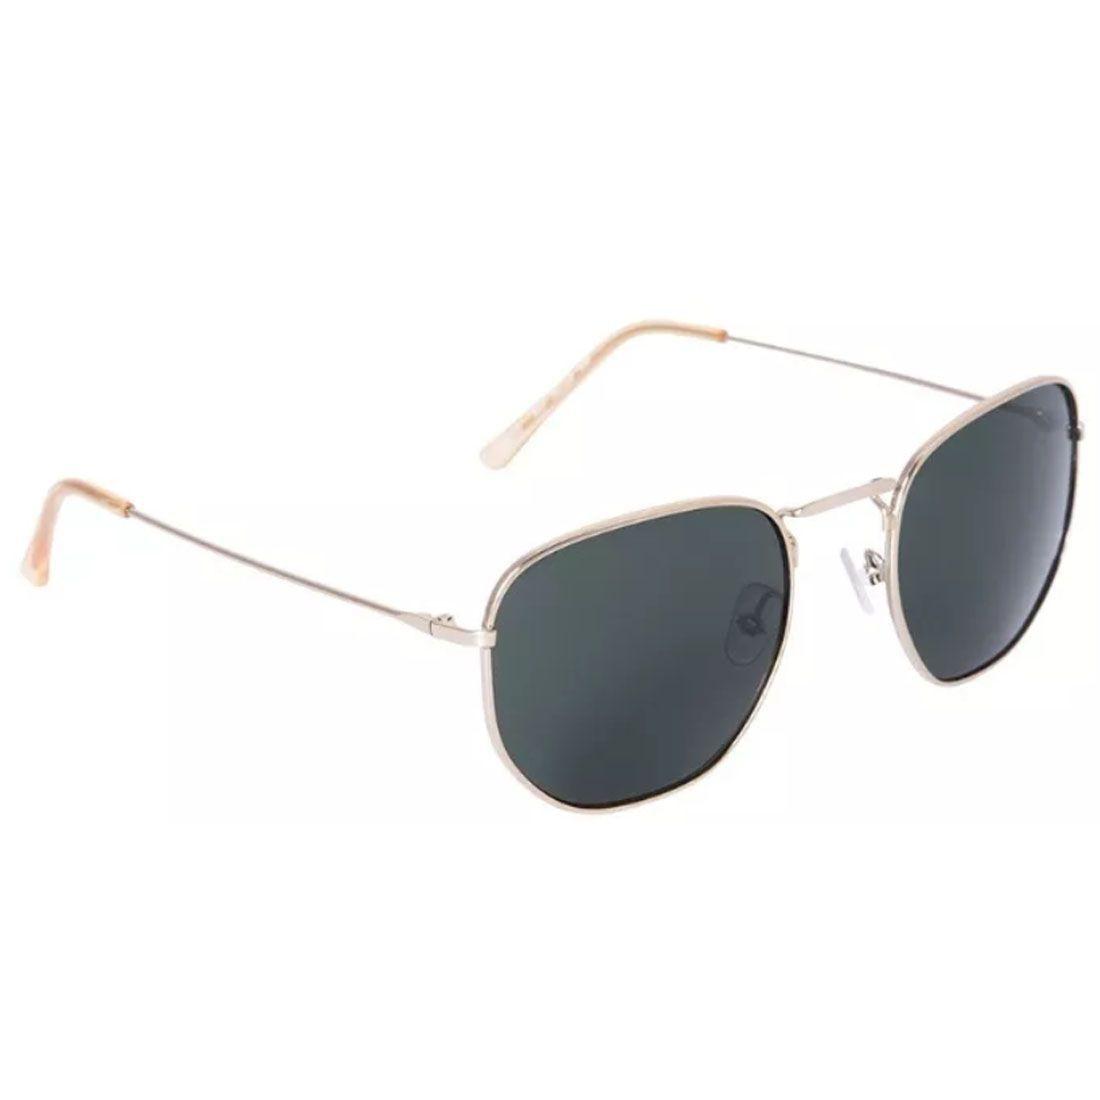 Óculos De Sol Helena Bordon Modelo Thassia Original